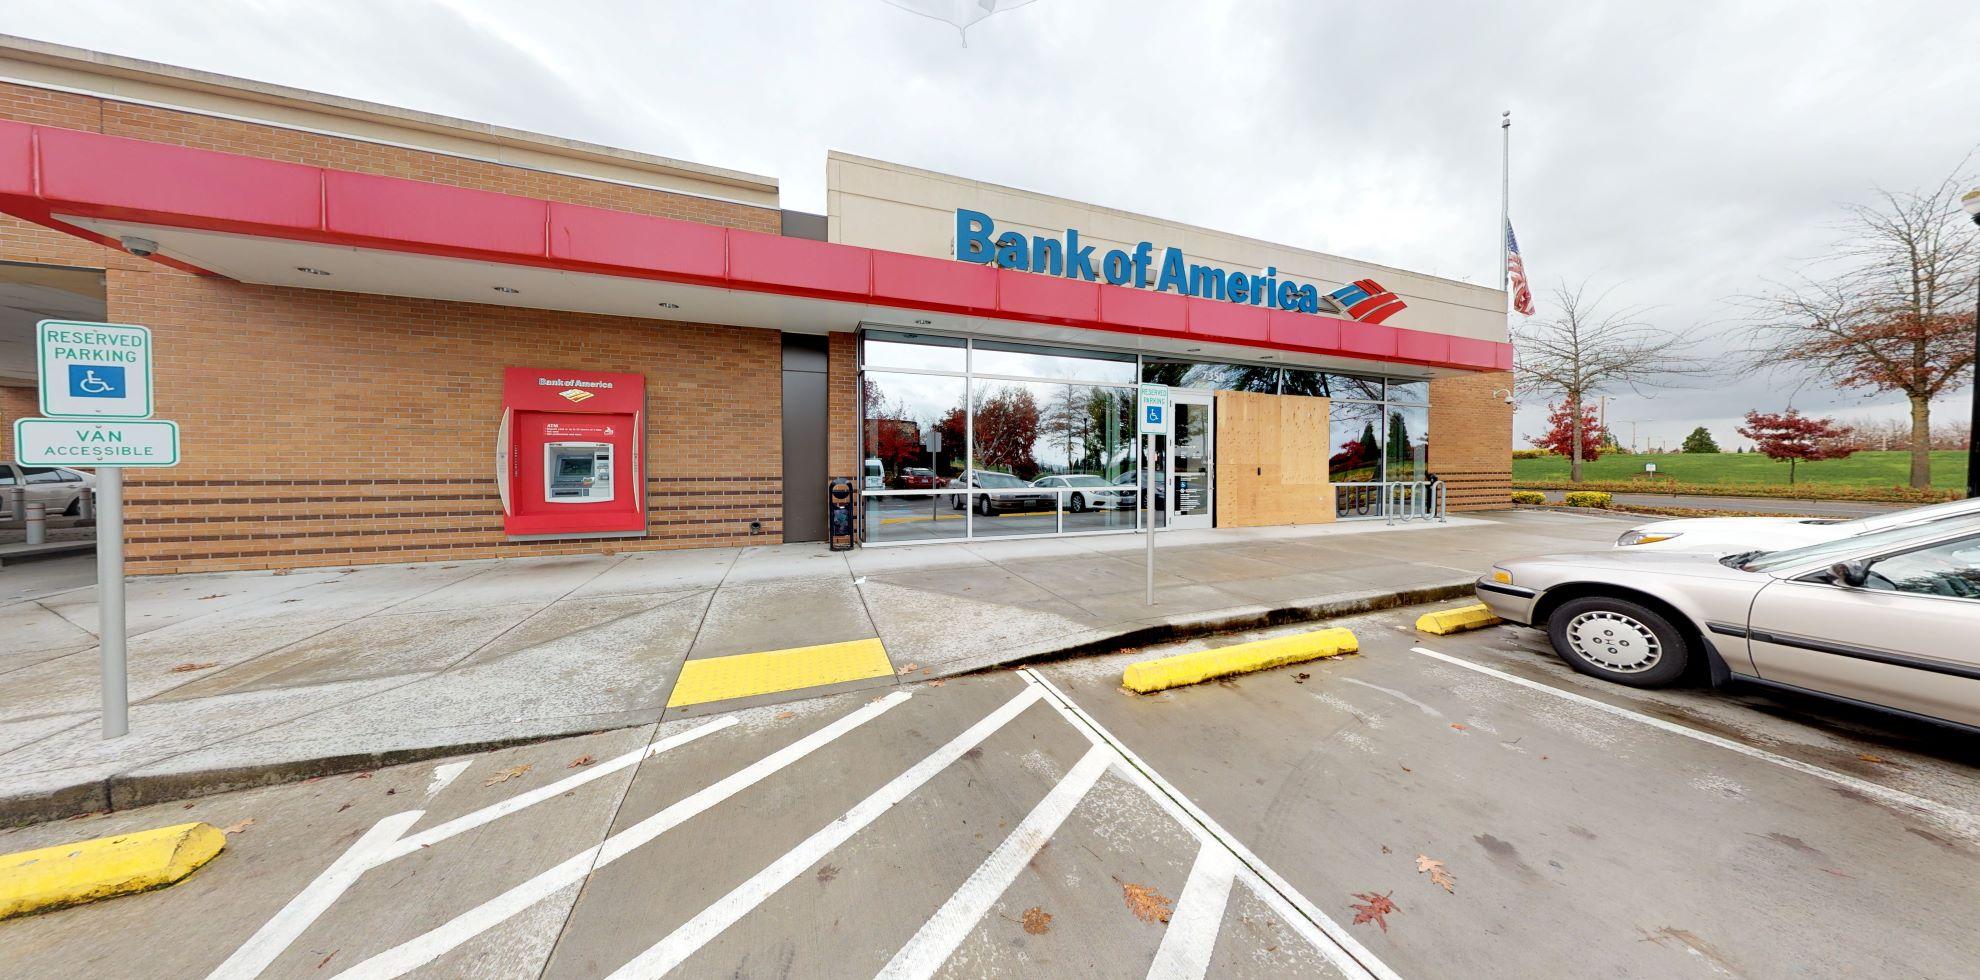 Bank of America financial center with drive-thru ATM | 7350 NE Cornell Rd, Hillsboro, OR 97124